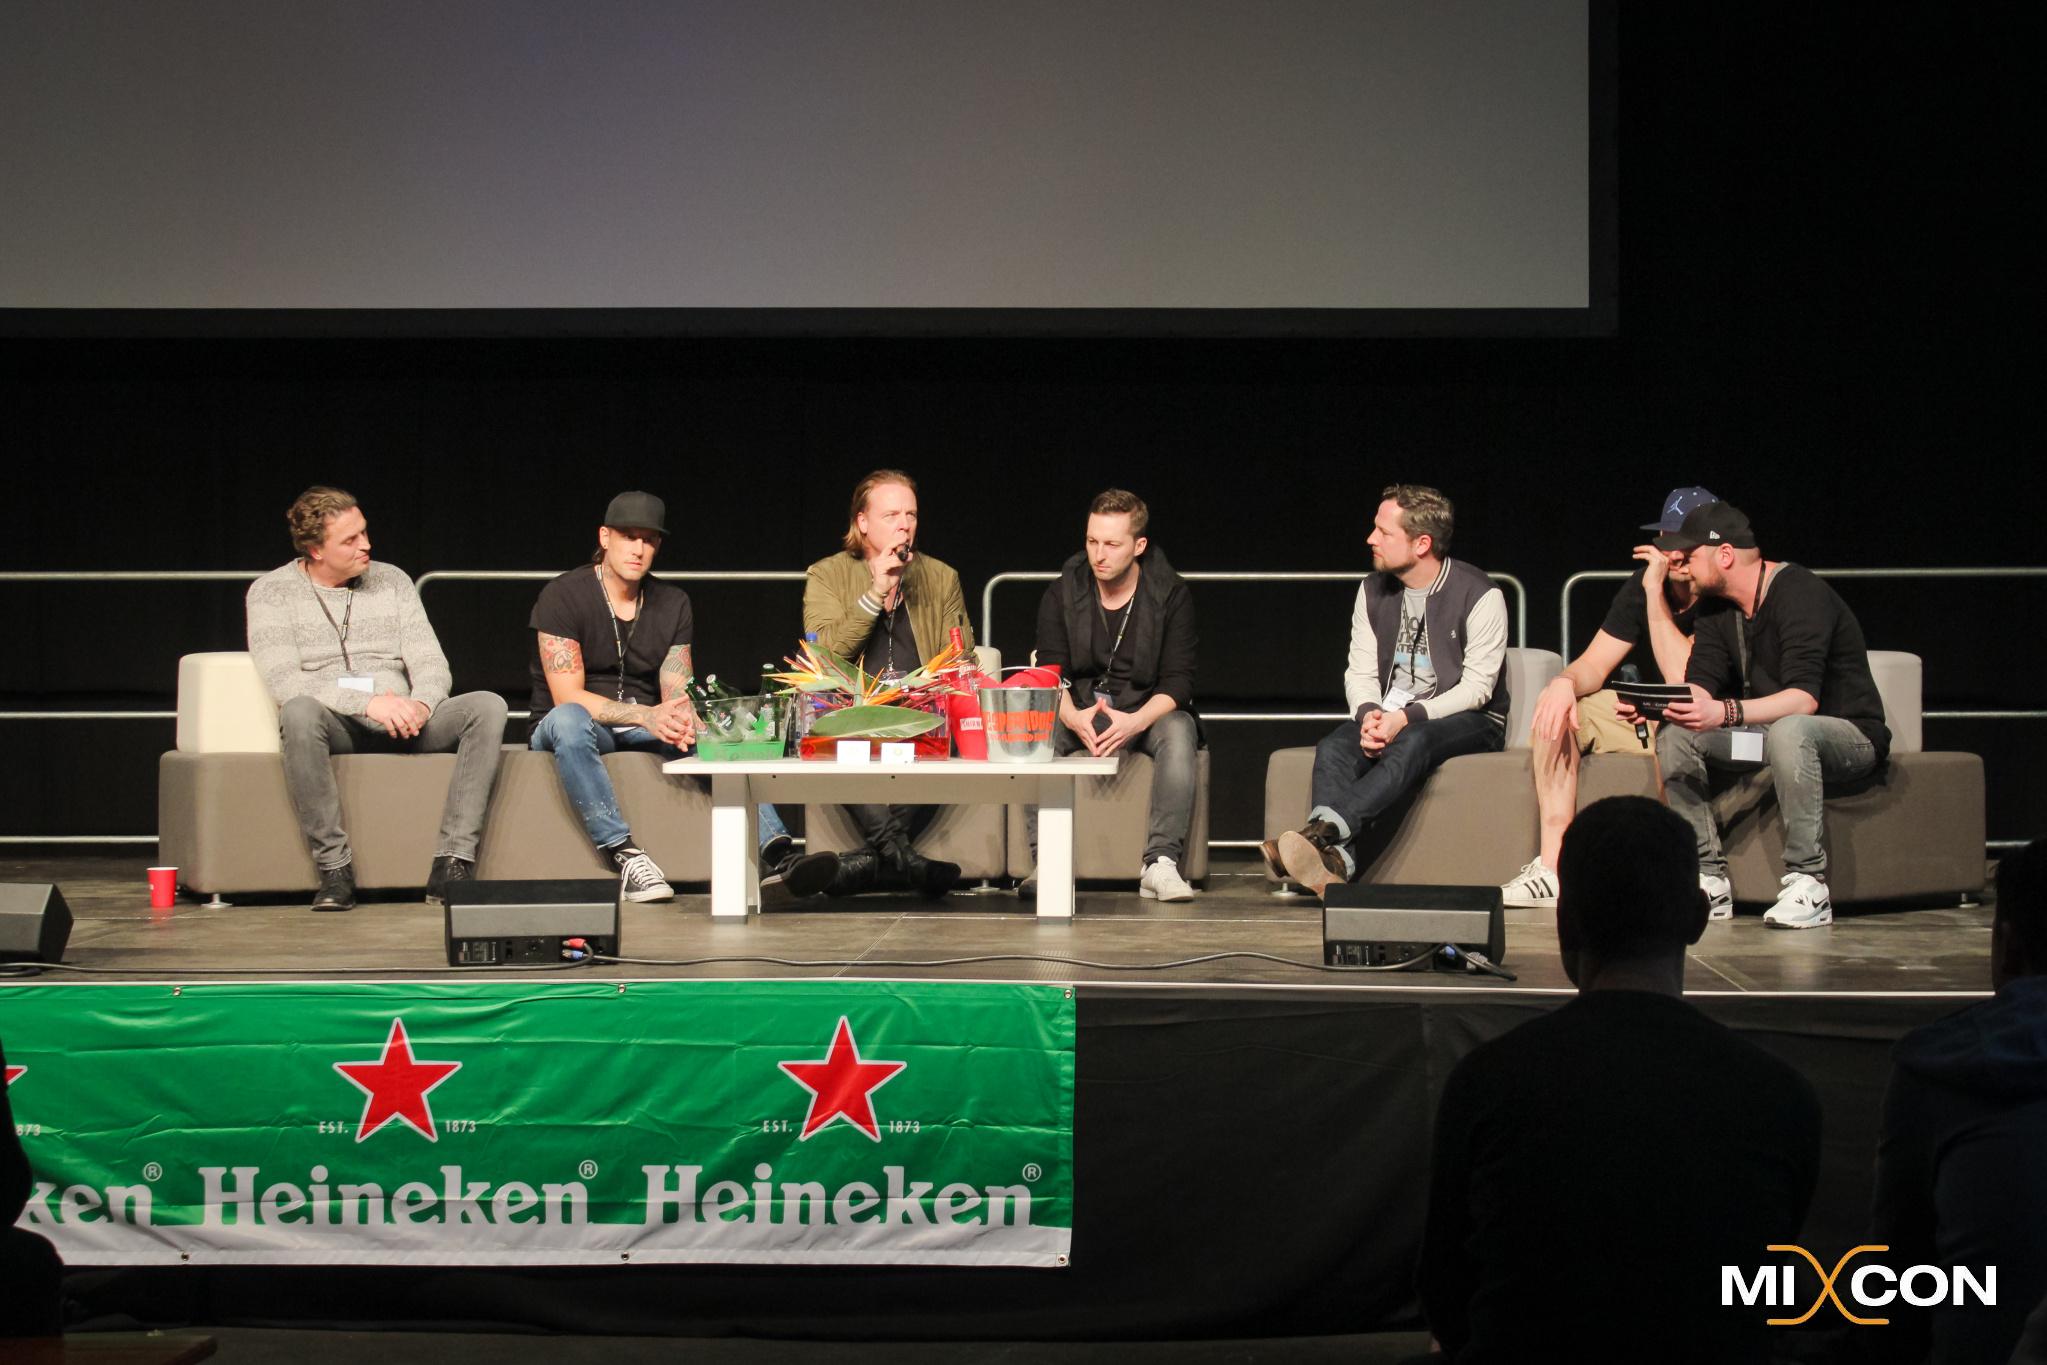 Jørn Brands, Niels van Gogh, Frank Klein, Dominik Koislmeyer, DJ Tonka, Bernd Closmann und Alex Sasse beim Panel